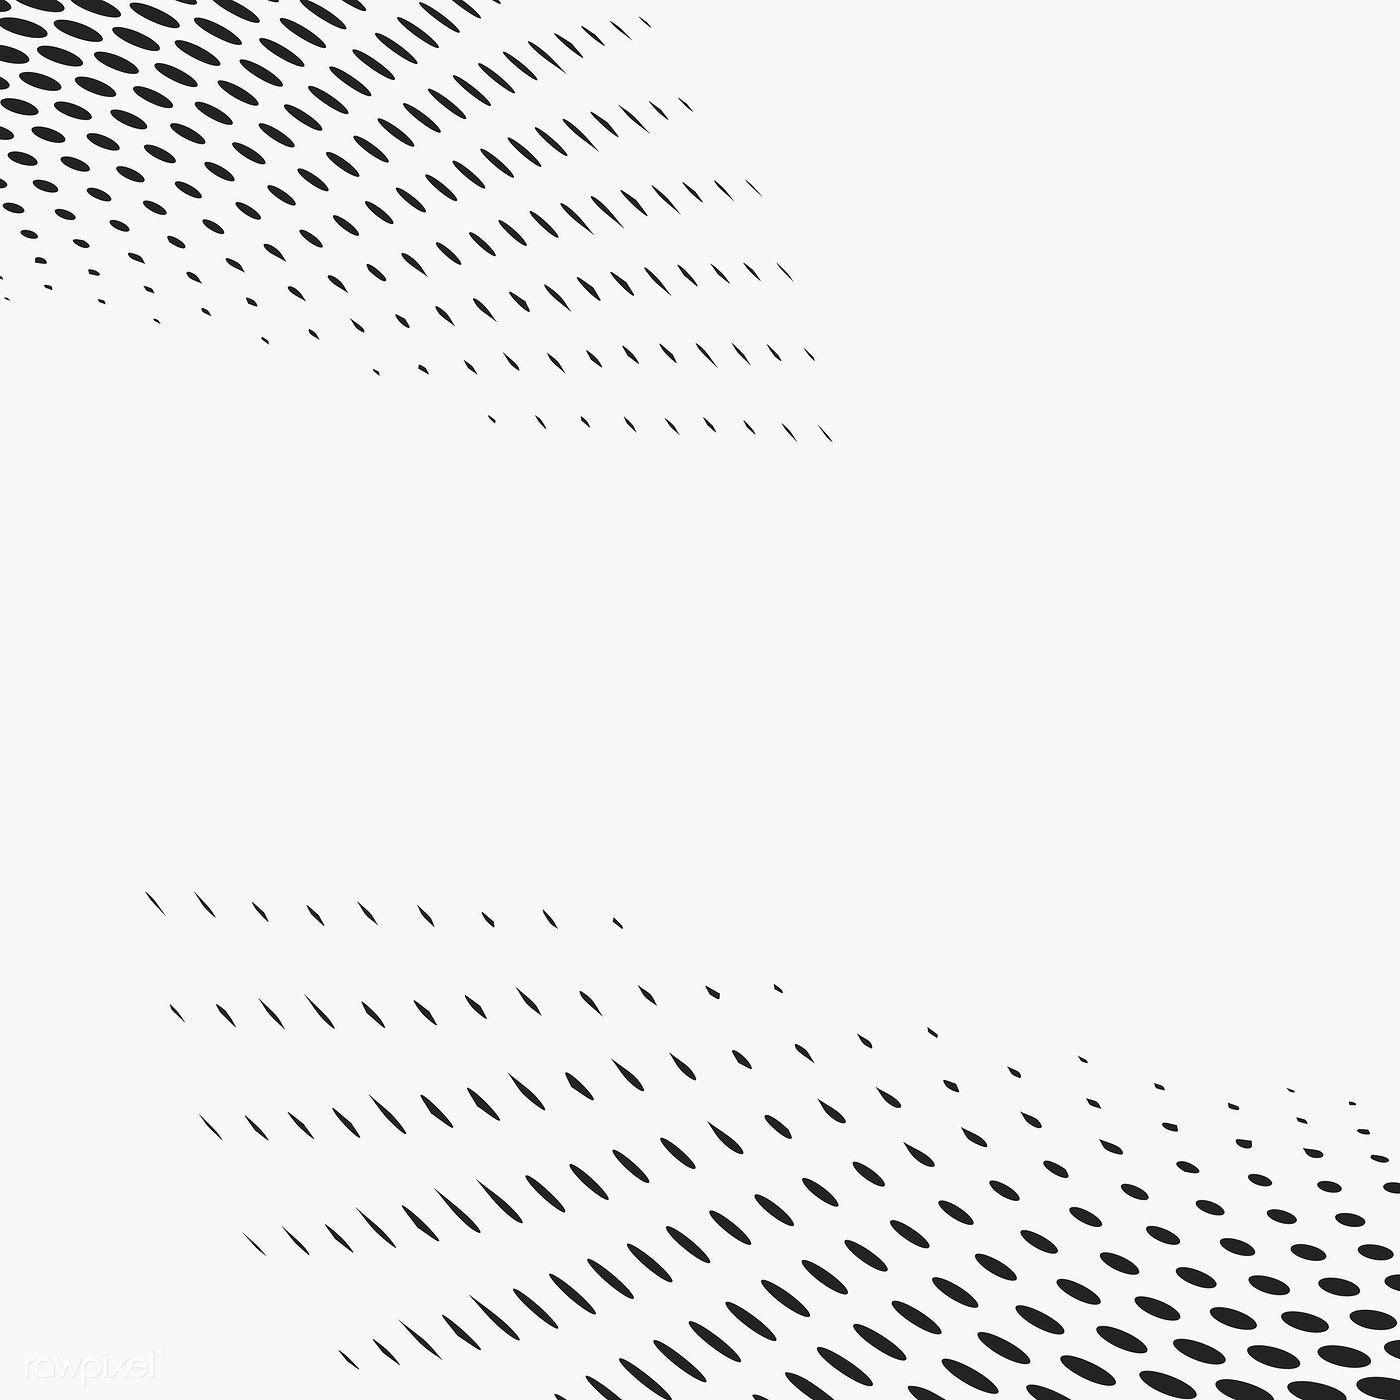 Black Halftone Dots Design Element Free Image By Rawpixel Com Nunny